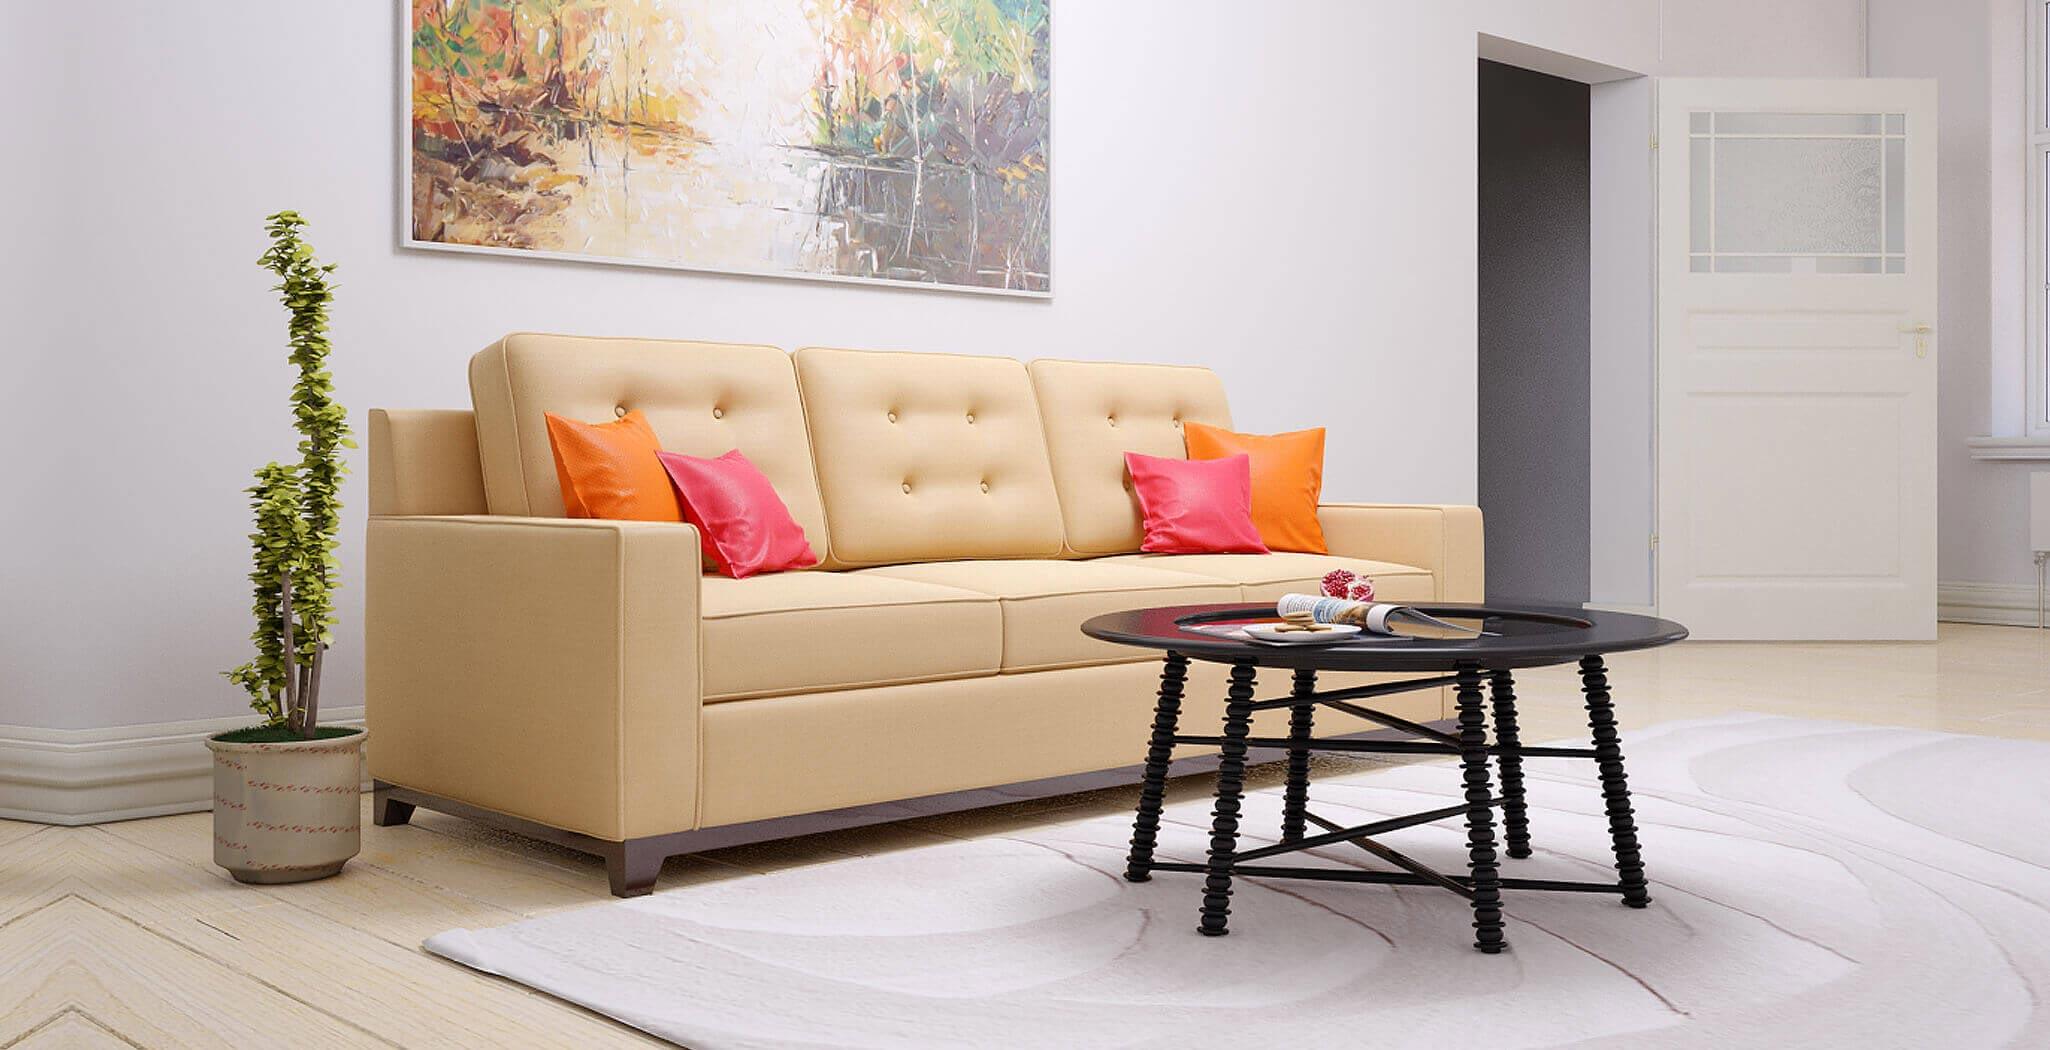 alexandria sofa furniture gallery 4